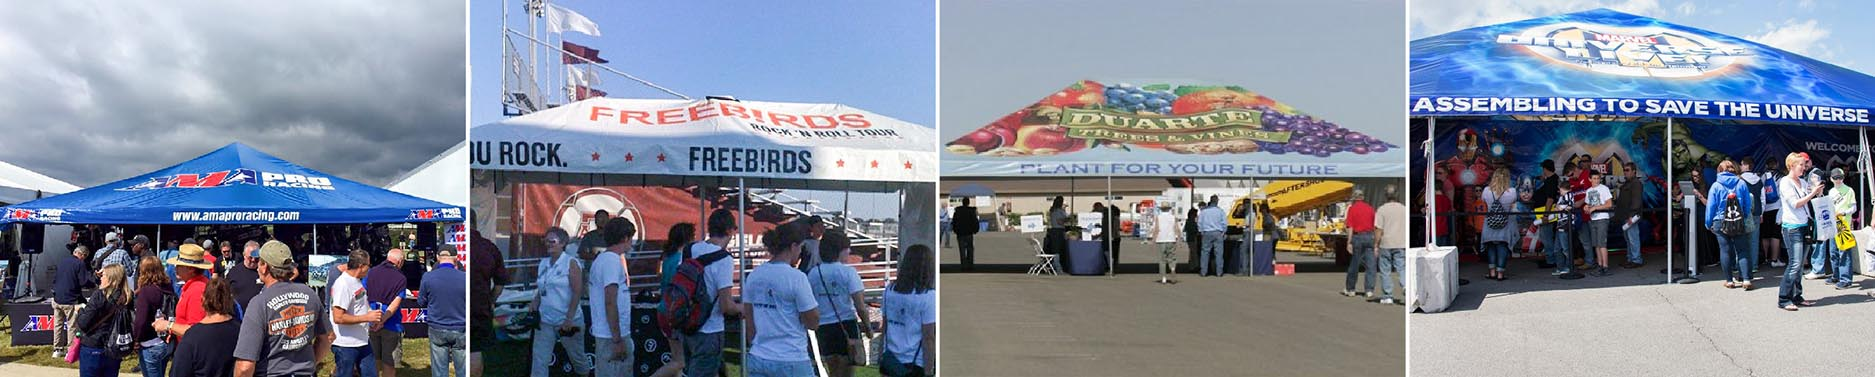 AMA Pro Racing, Freebirds, Duarte, and Marvel Standard Frame Tents